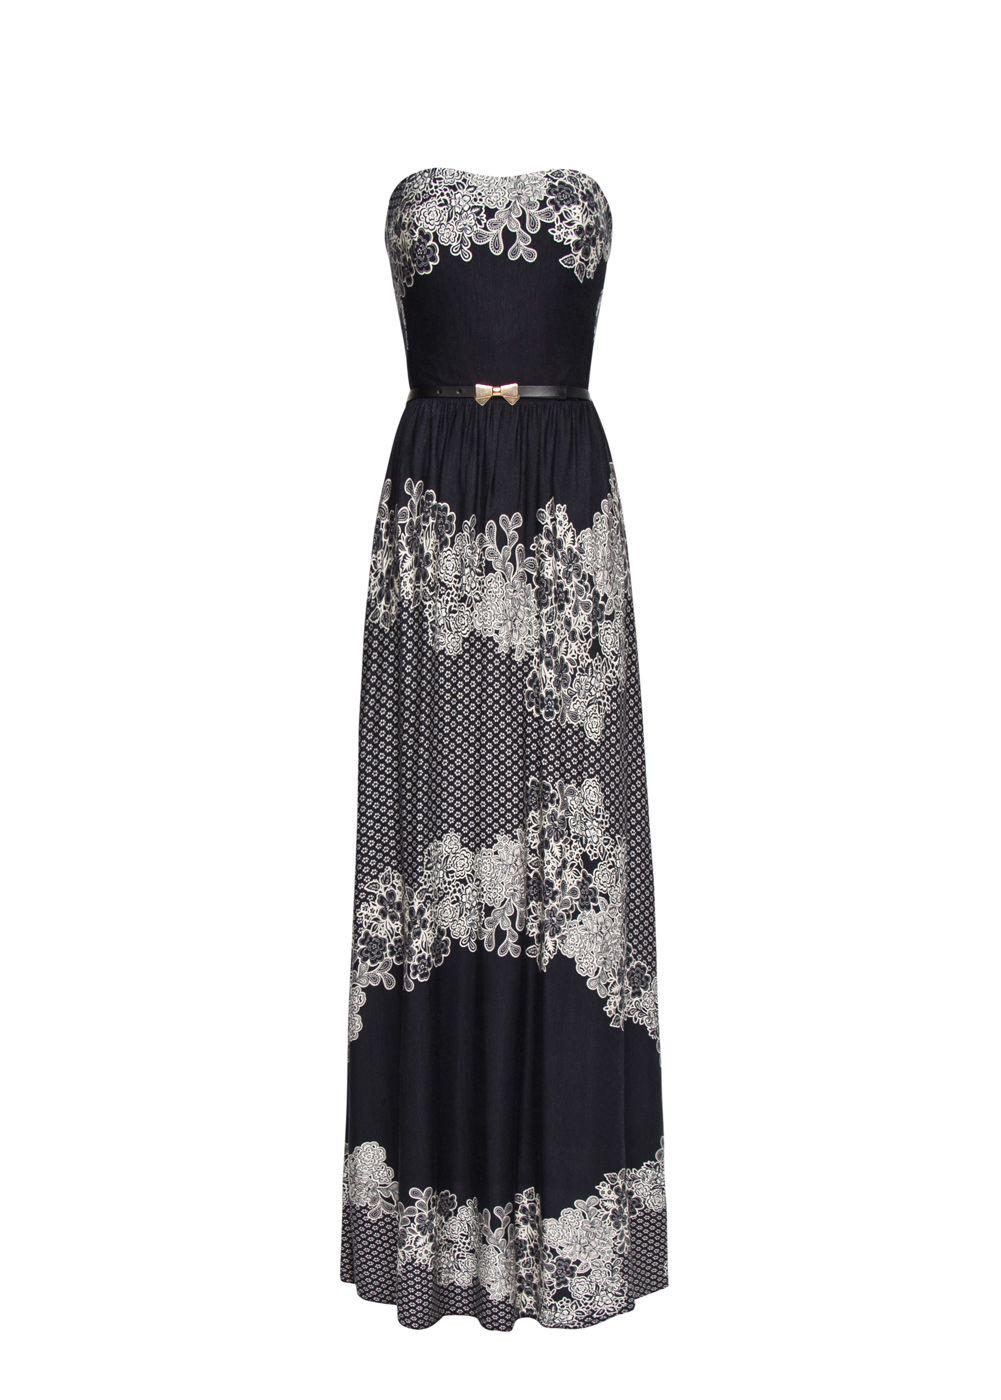 MANGO - CLOTHING - Dresses - Cocktail - Floral print maxi-dress